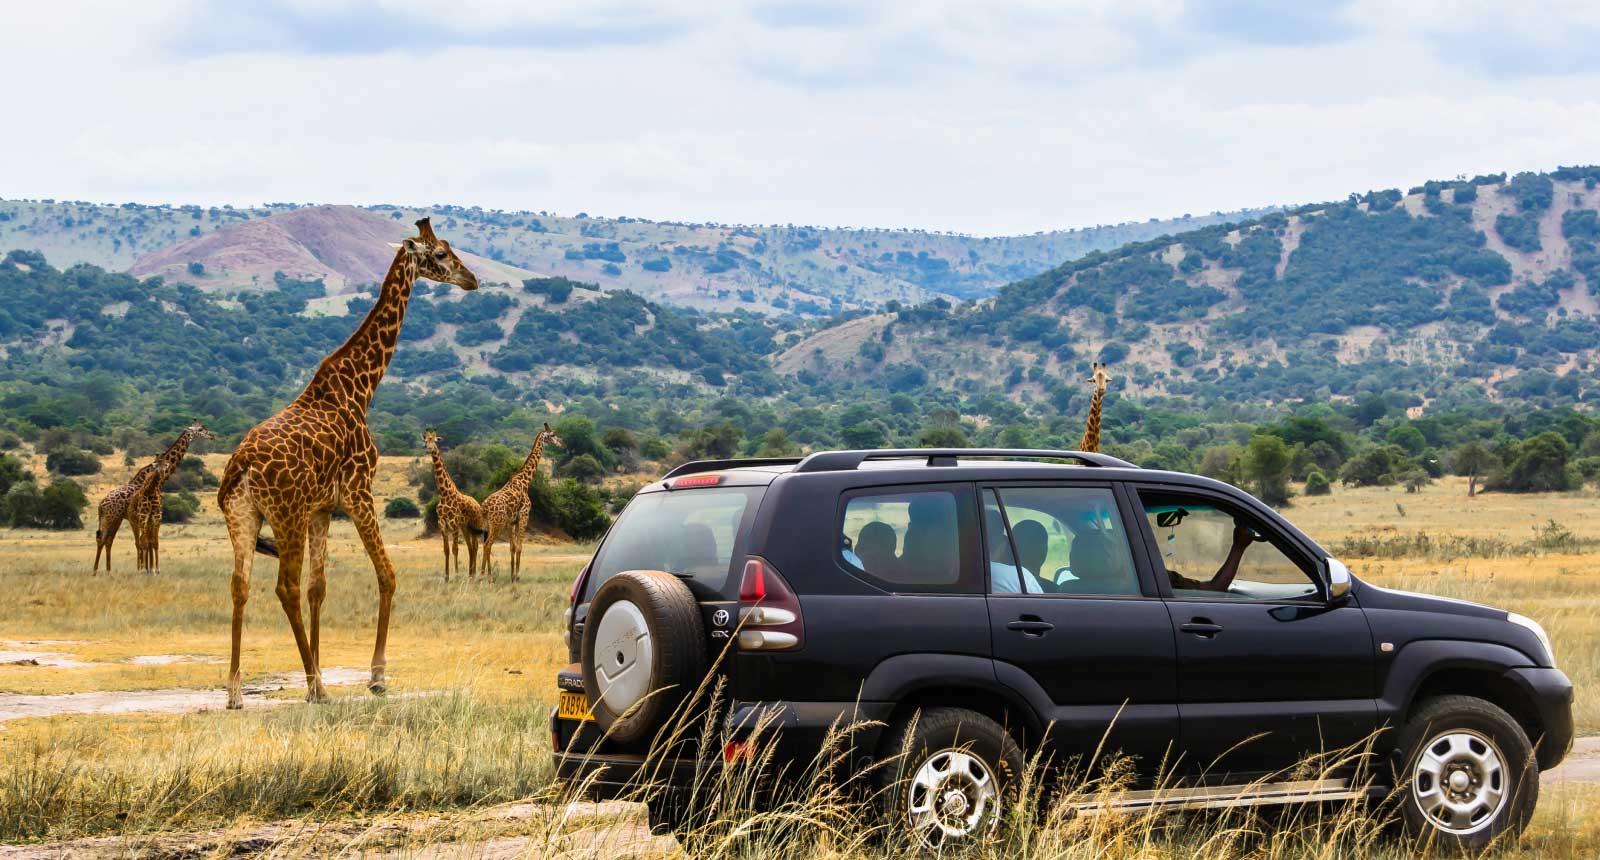 Akagera Safari